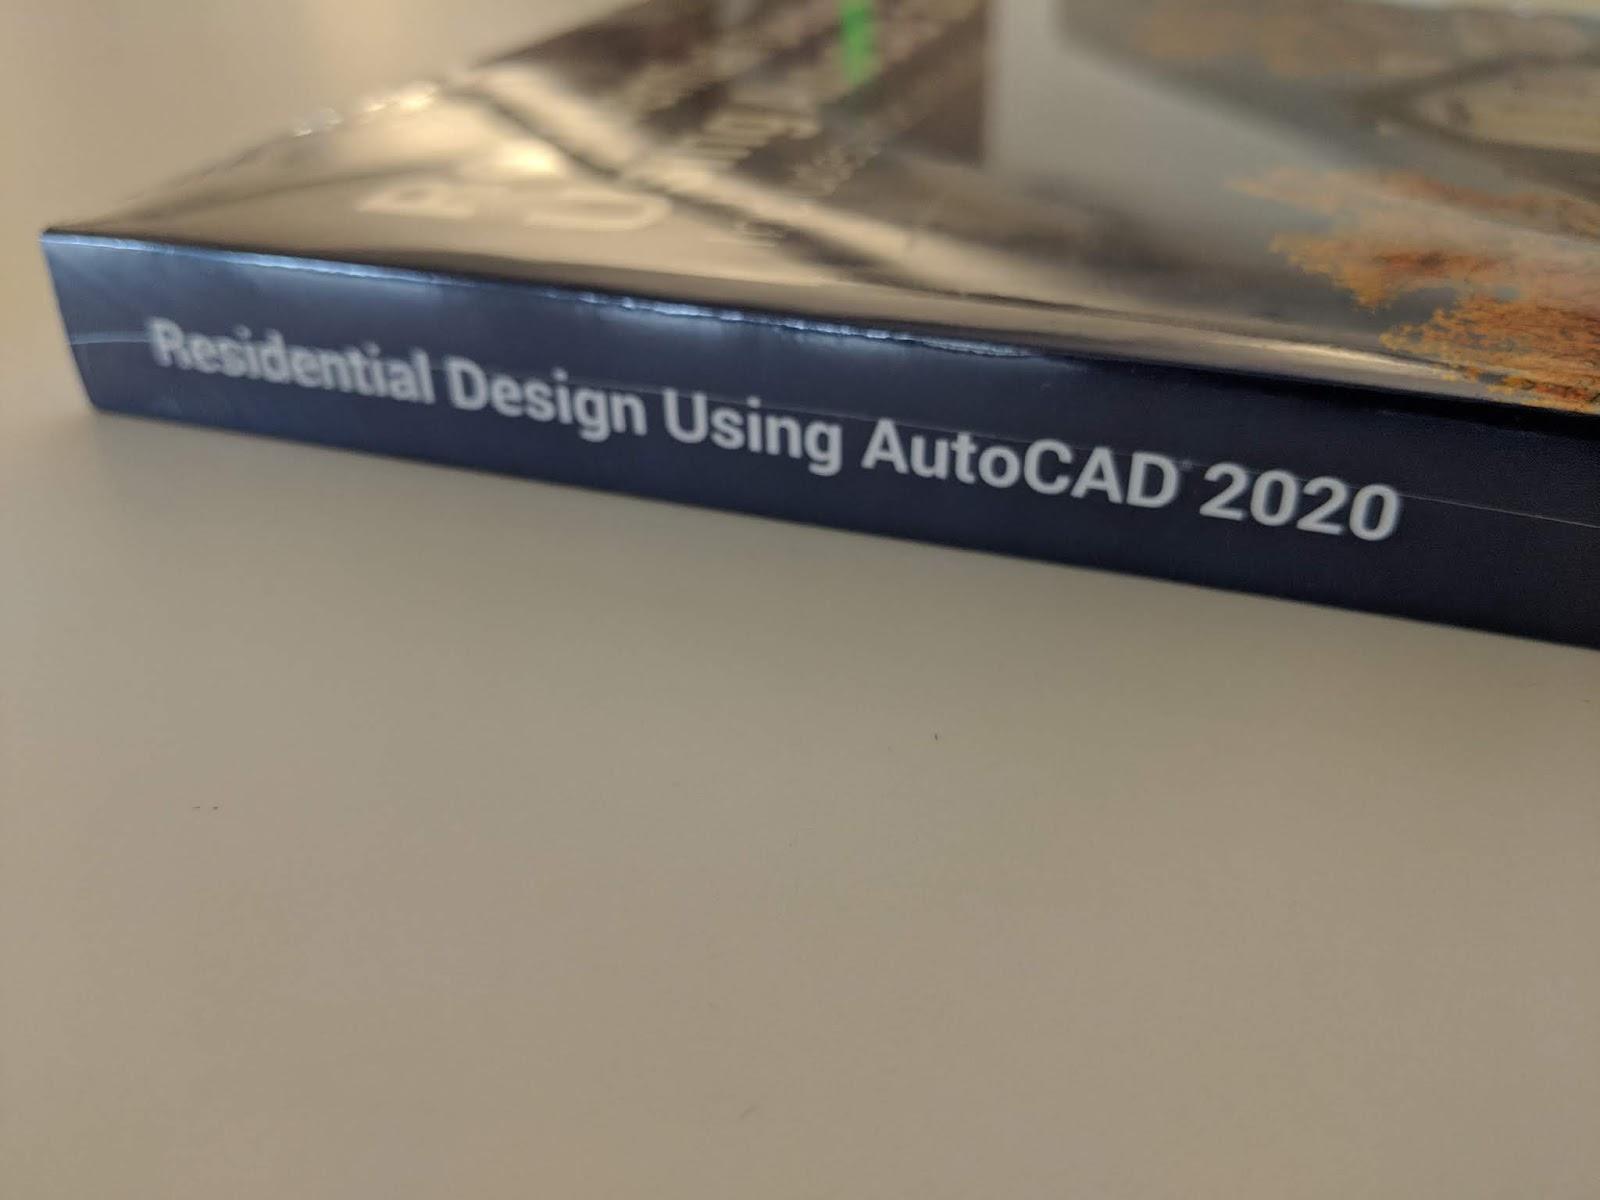 BIM Chapters: My New AutoCAD 2020 Book